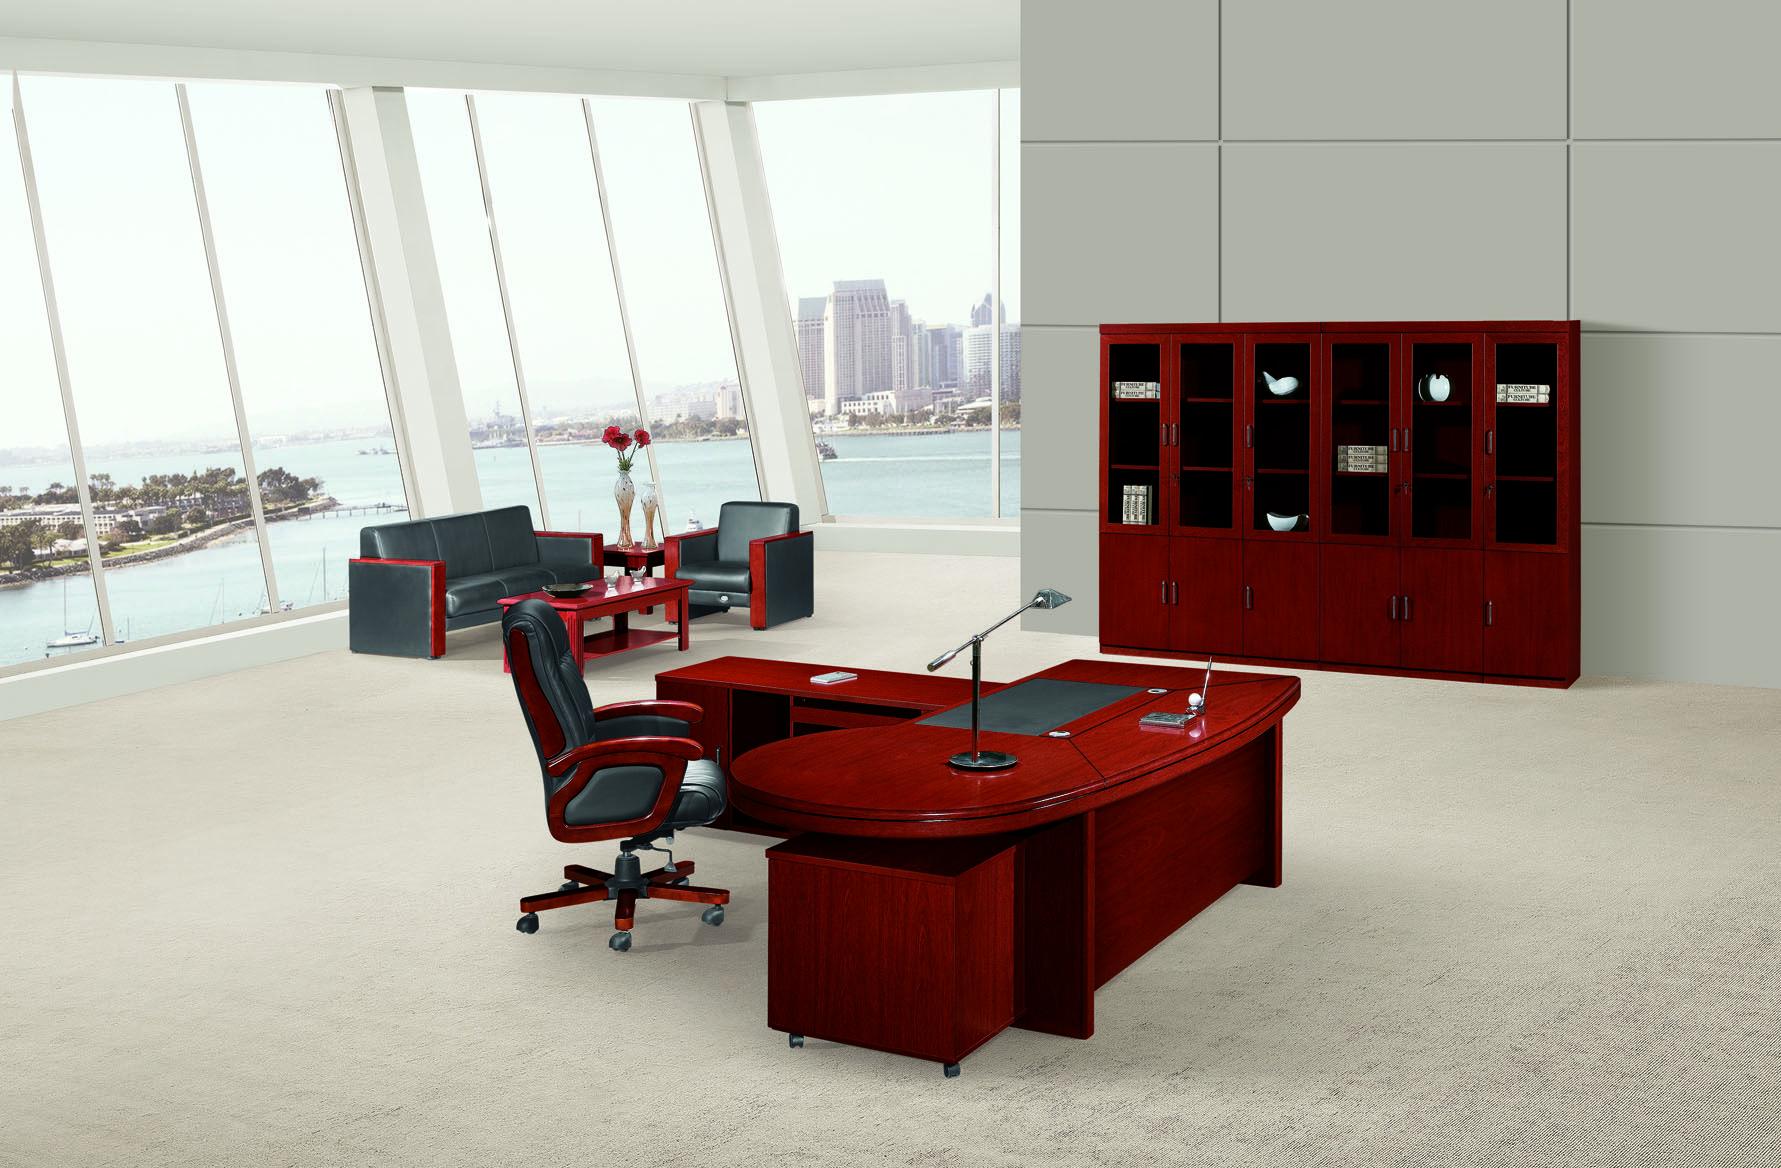 Of 123 Director Executive Series Oscar Furniture Dubai Uae Abudhabi Design Furnishing Interior Furniture Furniture Companies Furnishings